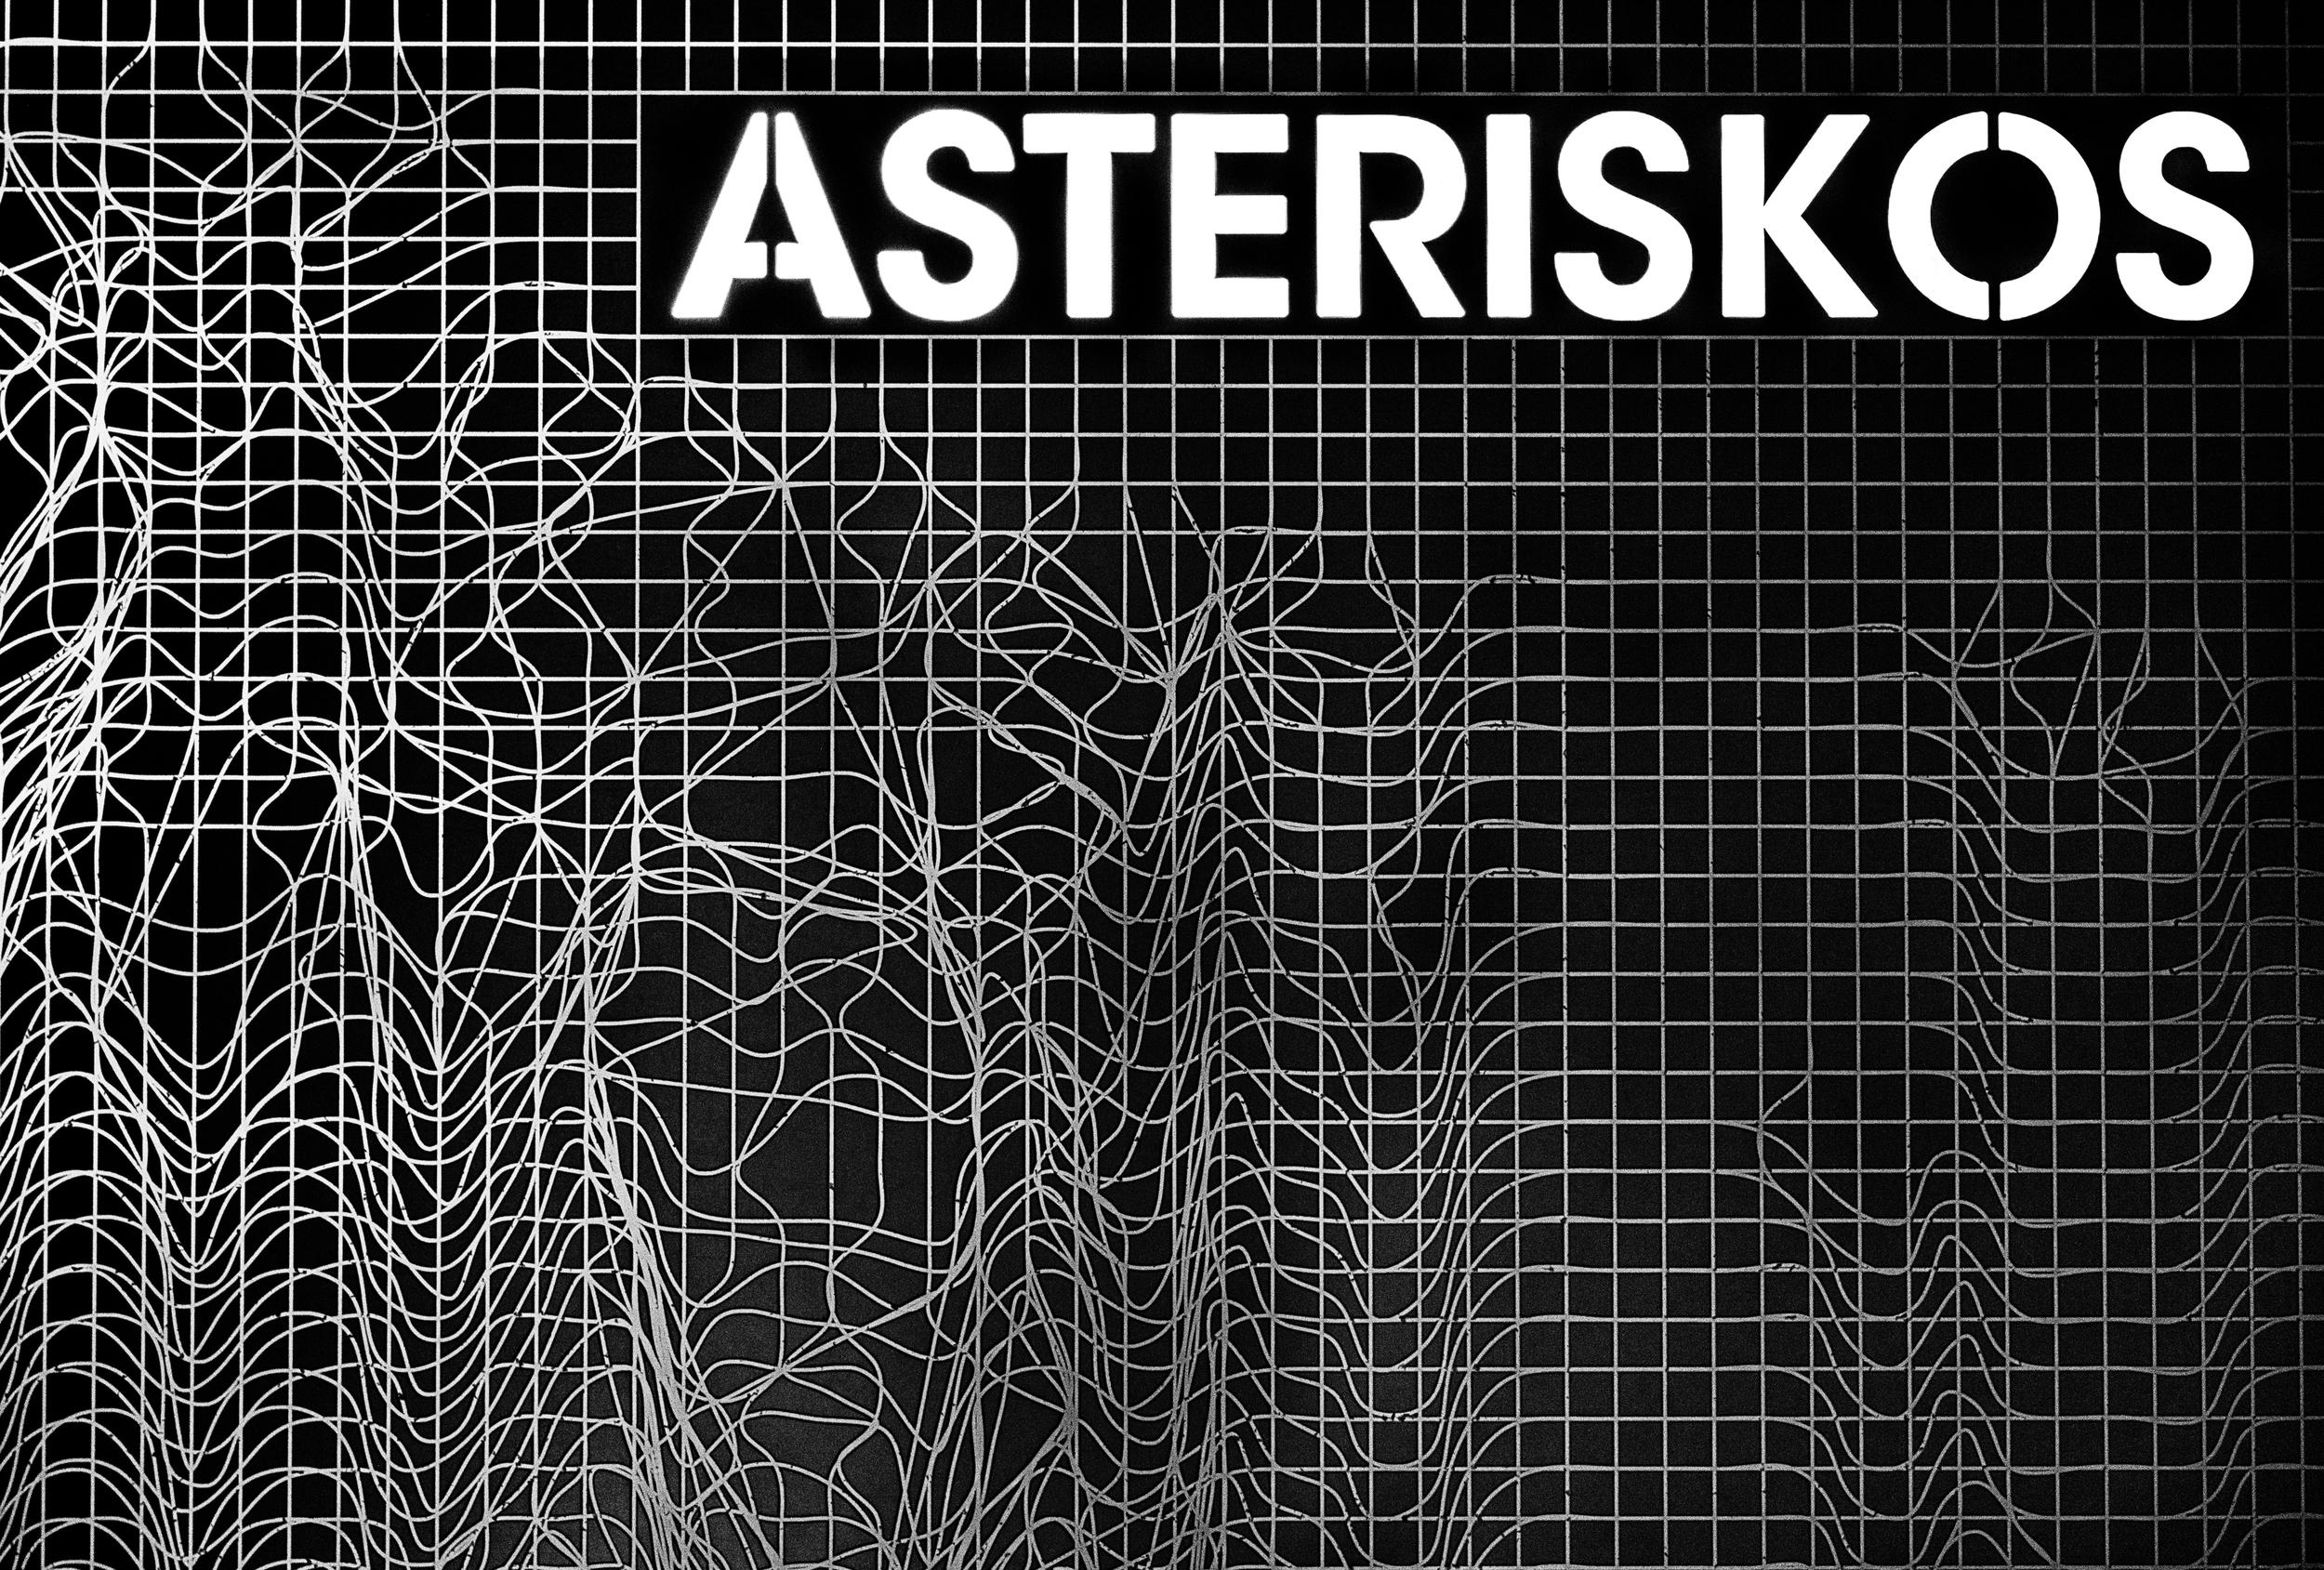 asteriskos-digital-fabrication-diffusion-panel-scripting2.jpg